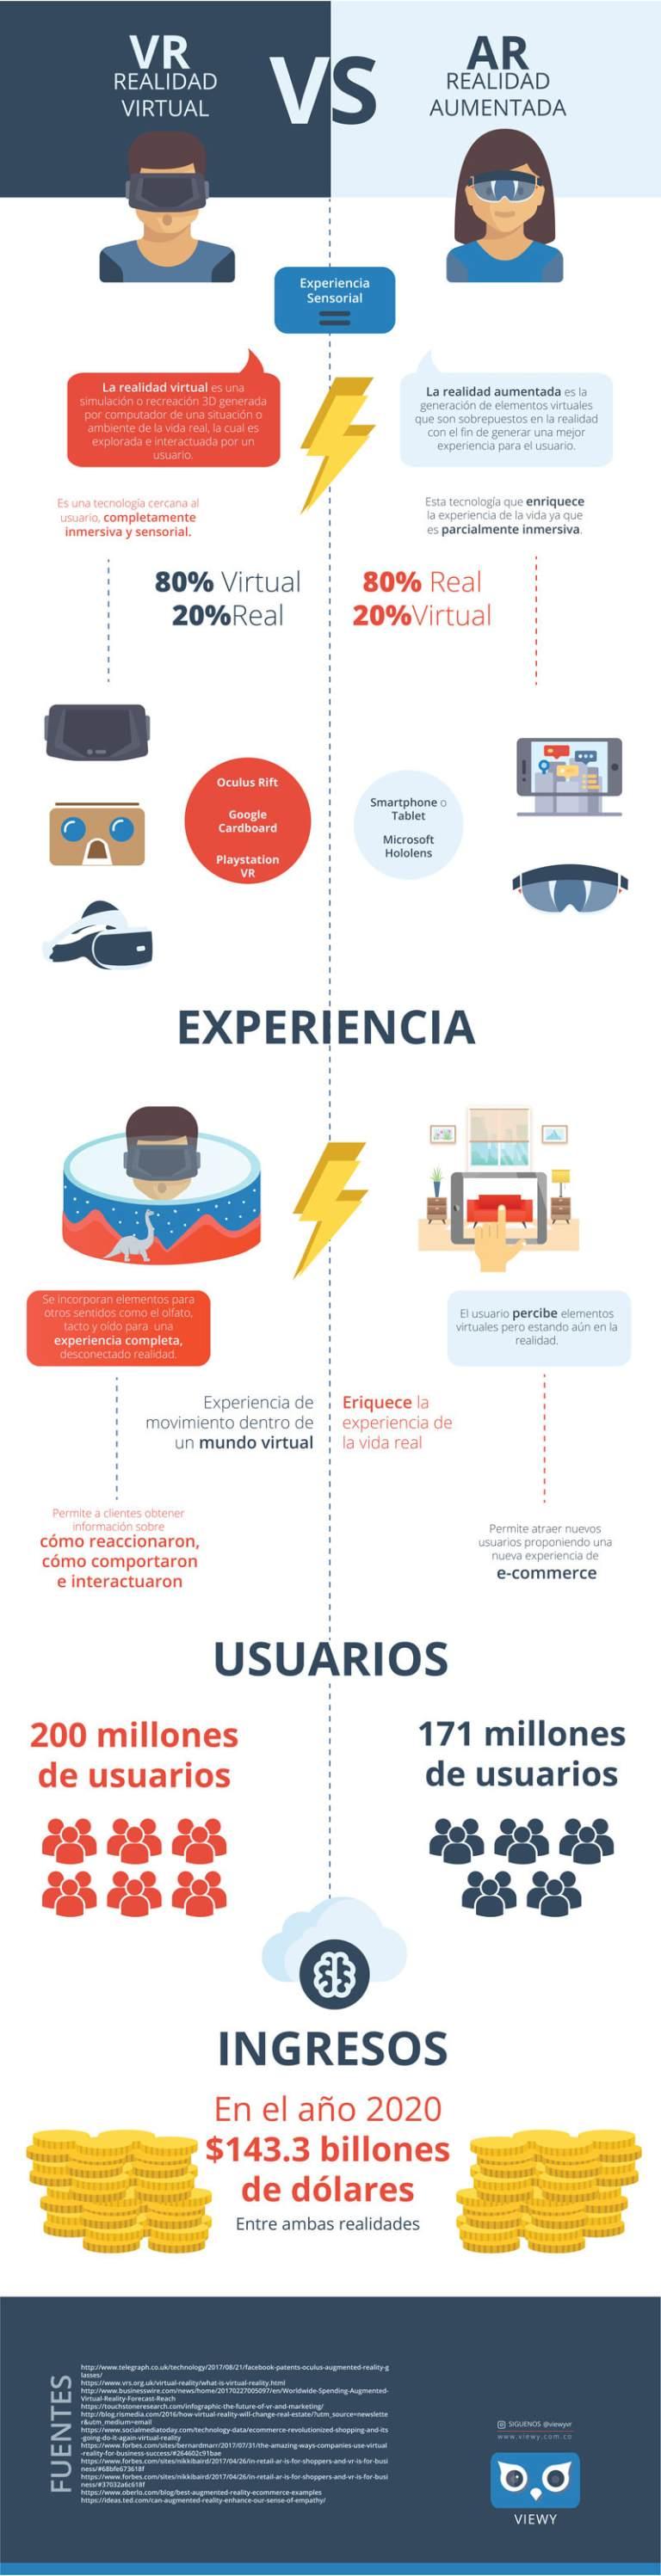 infografia realidad aumentada vs realidad virtual viewy